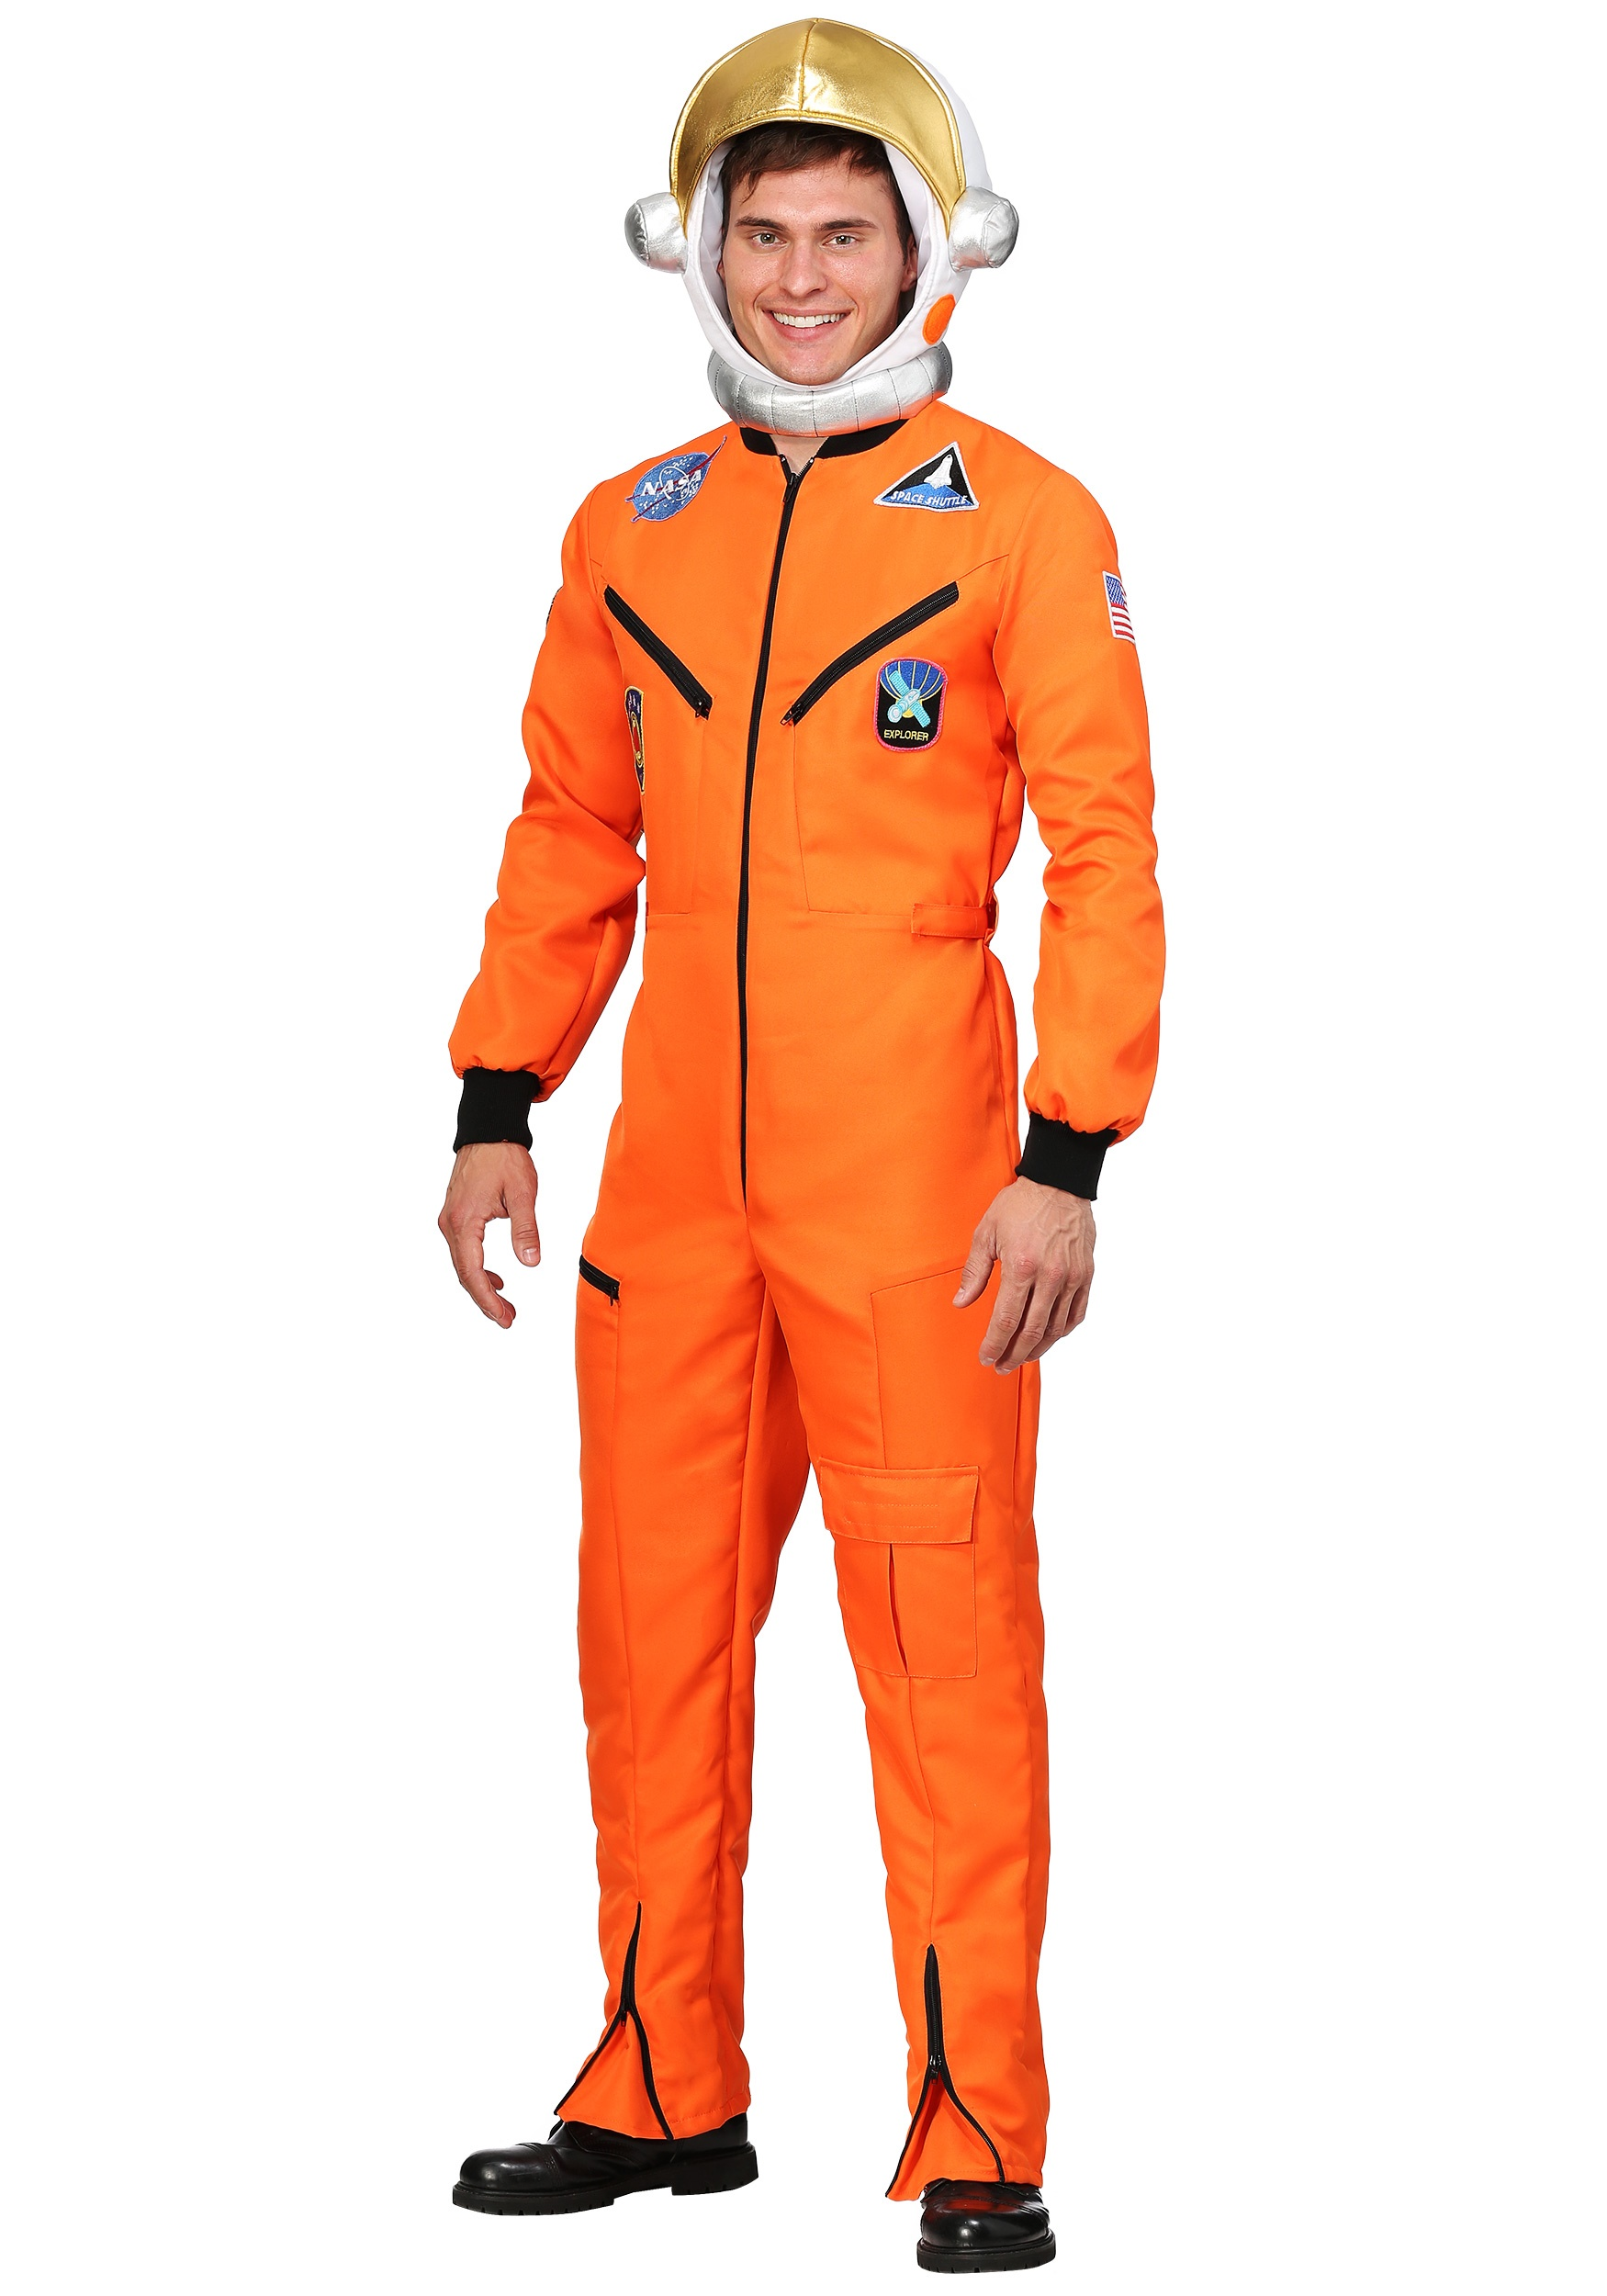 Orange Astronaut Jumpsuit Costume  sc 1 st  Halloween Costumes & Orange Astronaut Jumpsuit Adult Plus Size Costume